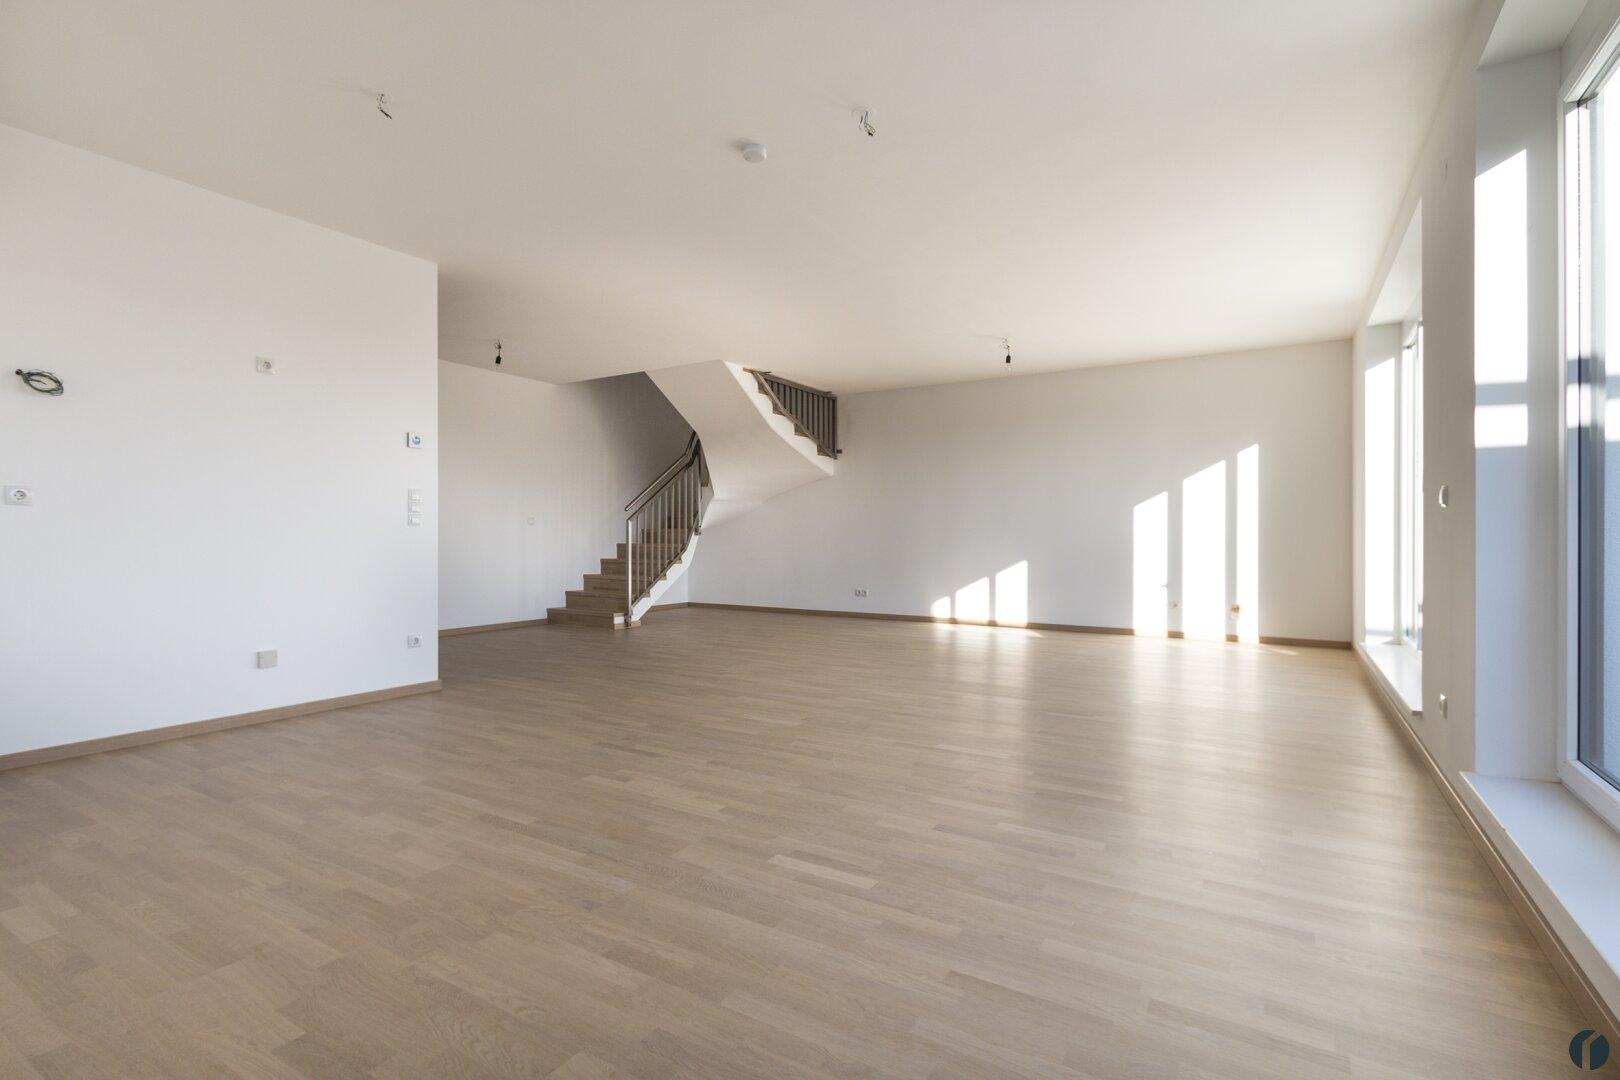 Musterwohnung Wohnraum